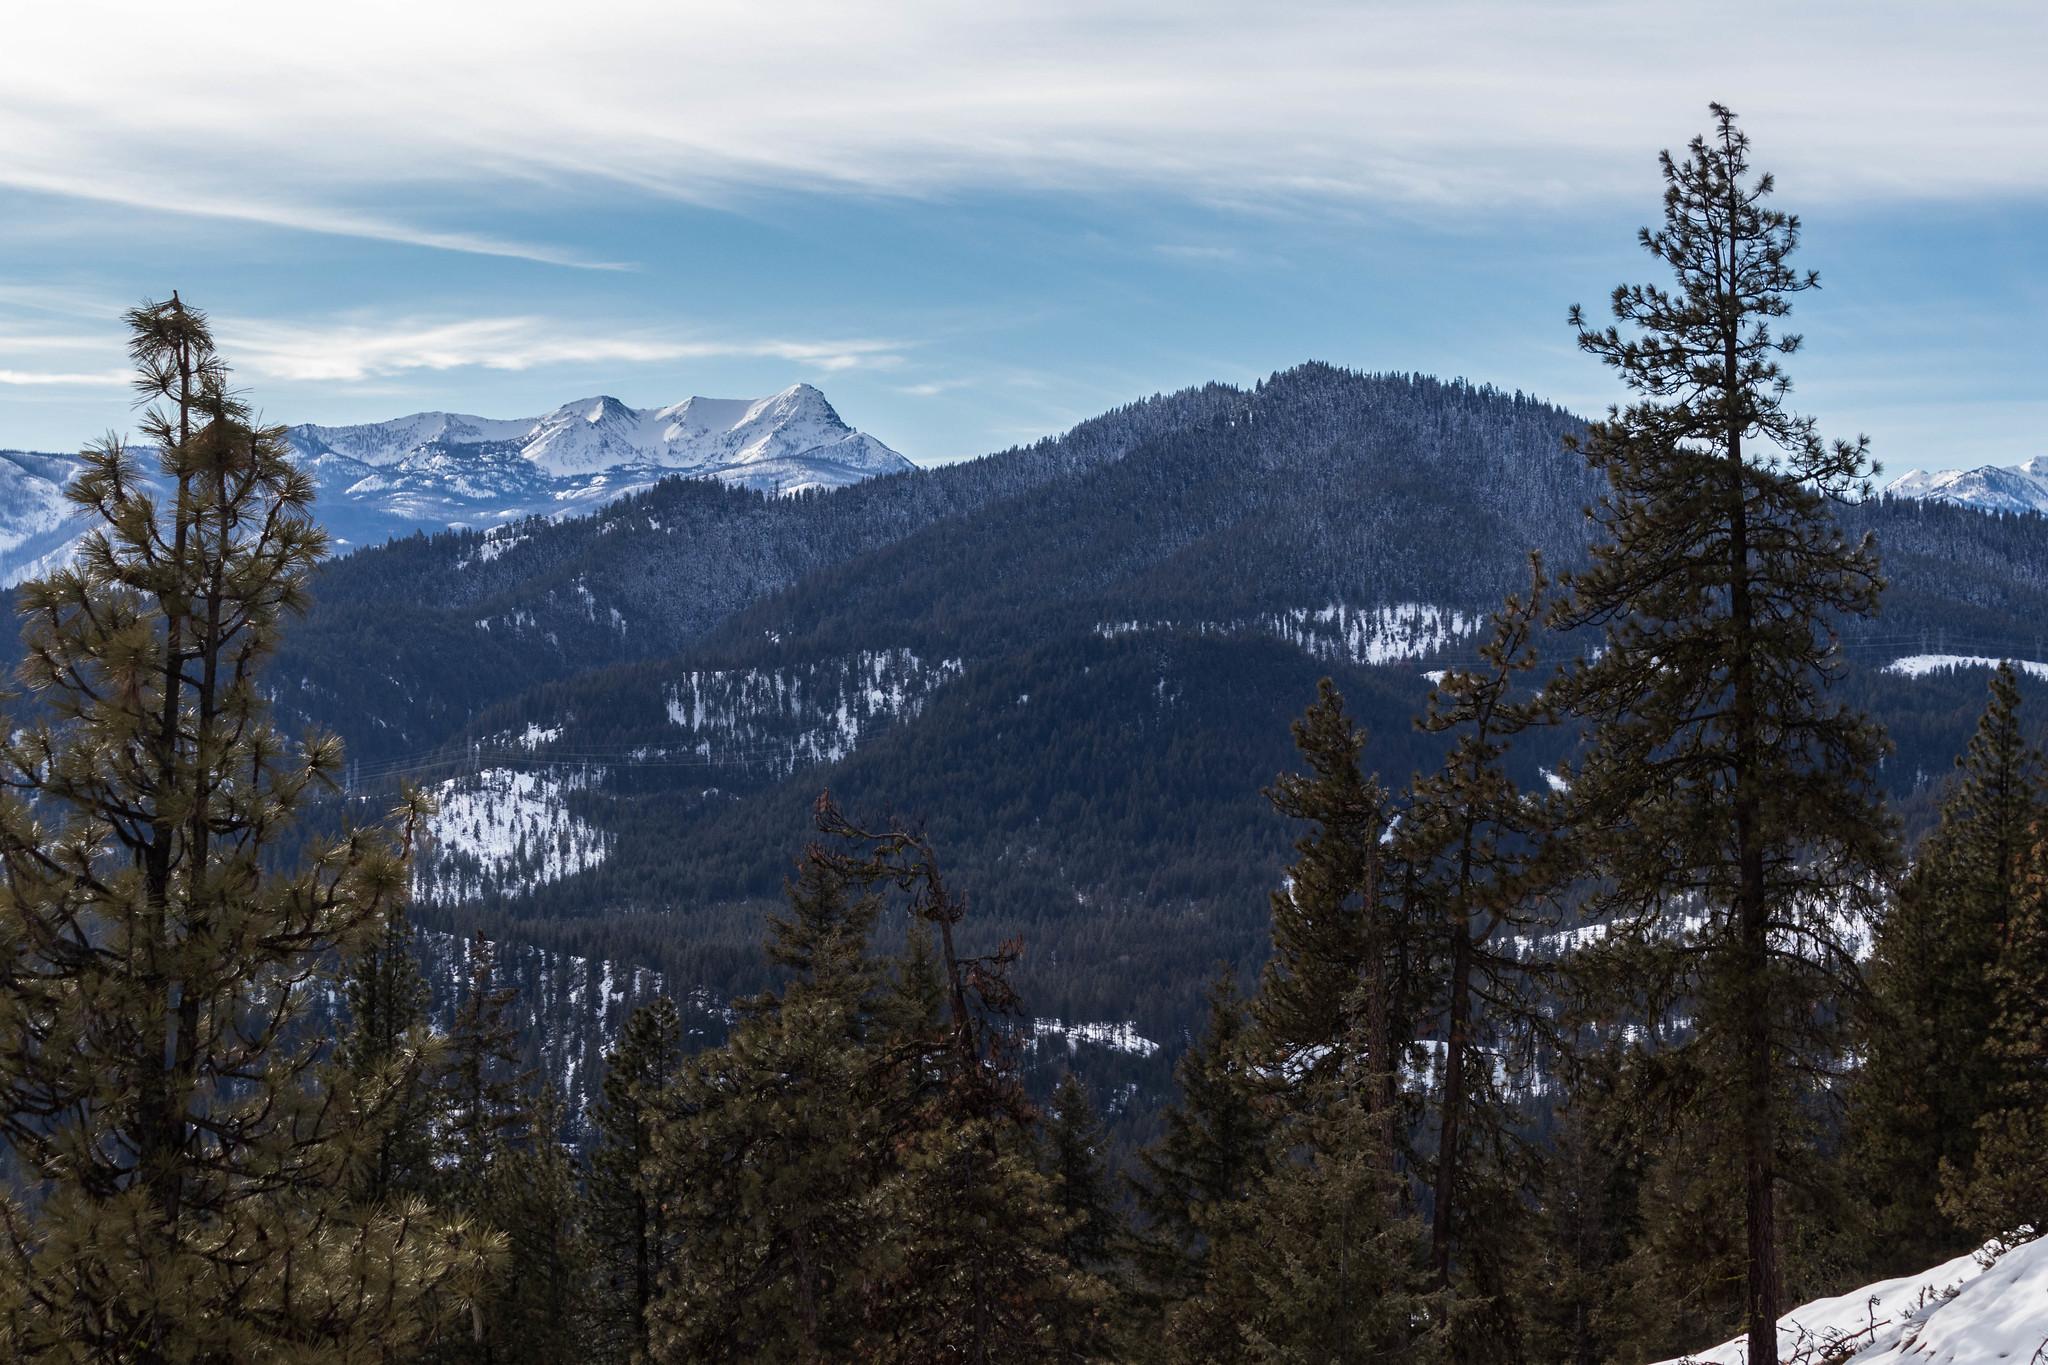 Big Jim Hill and Natapoc Mountain